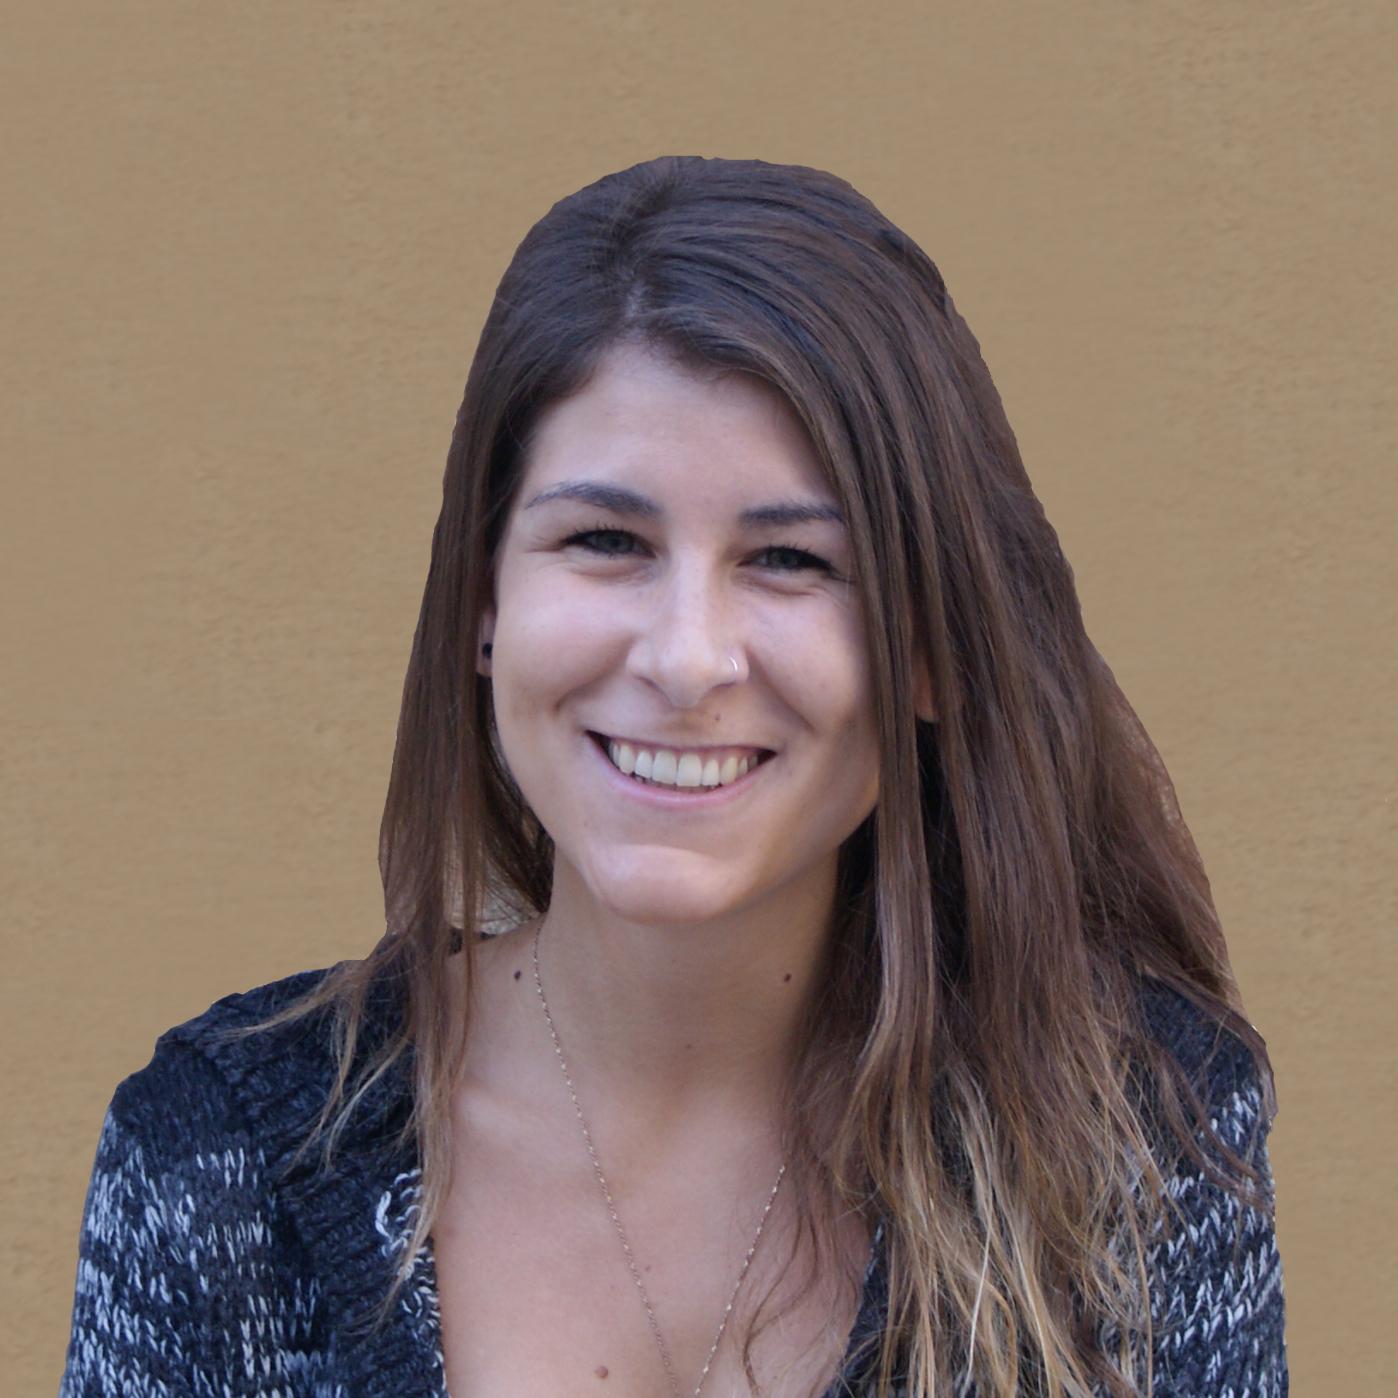 Laura Padula